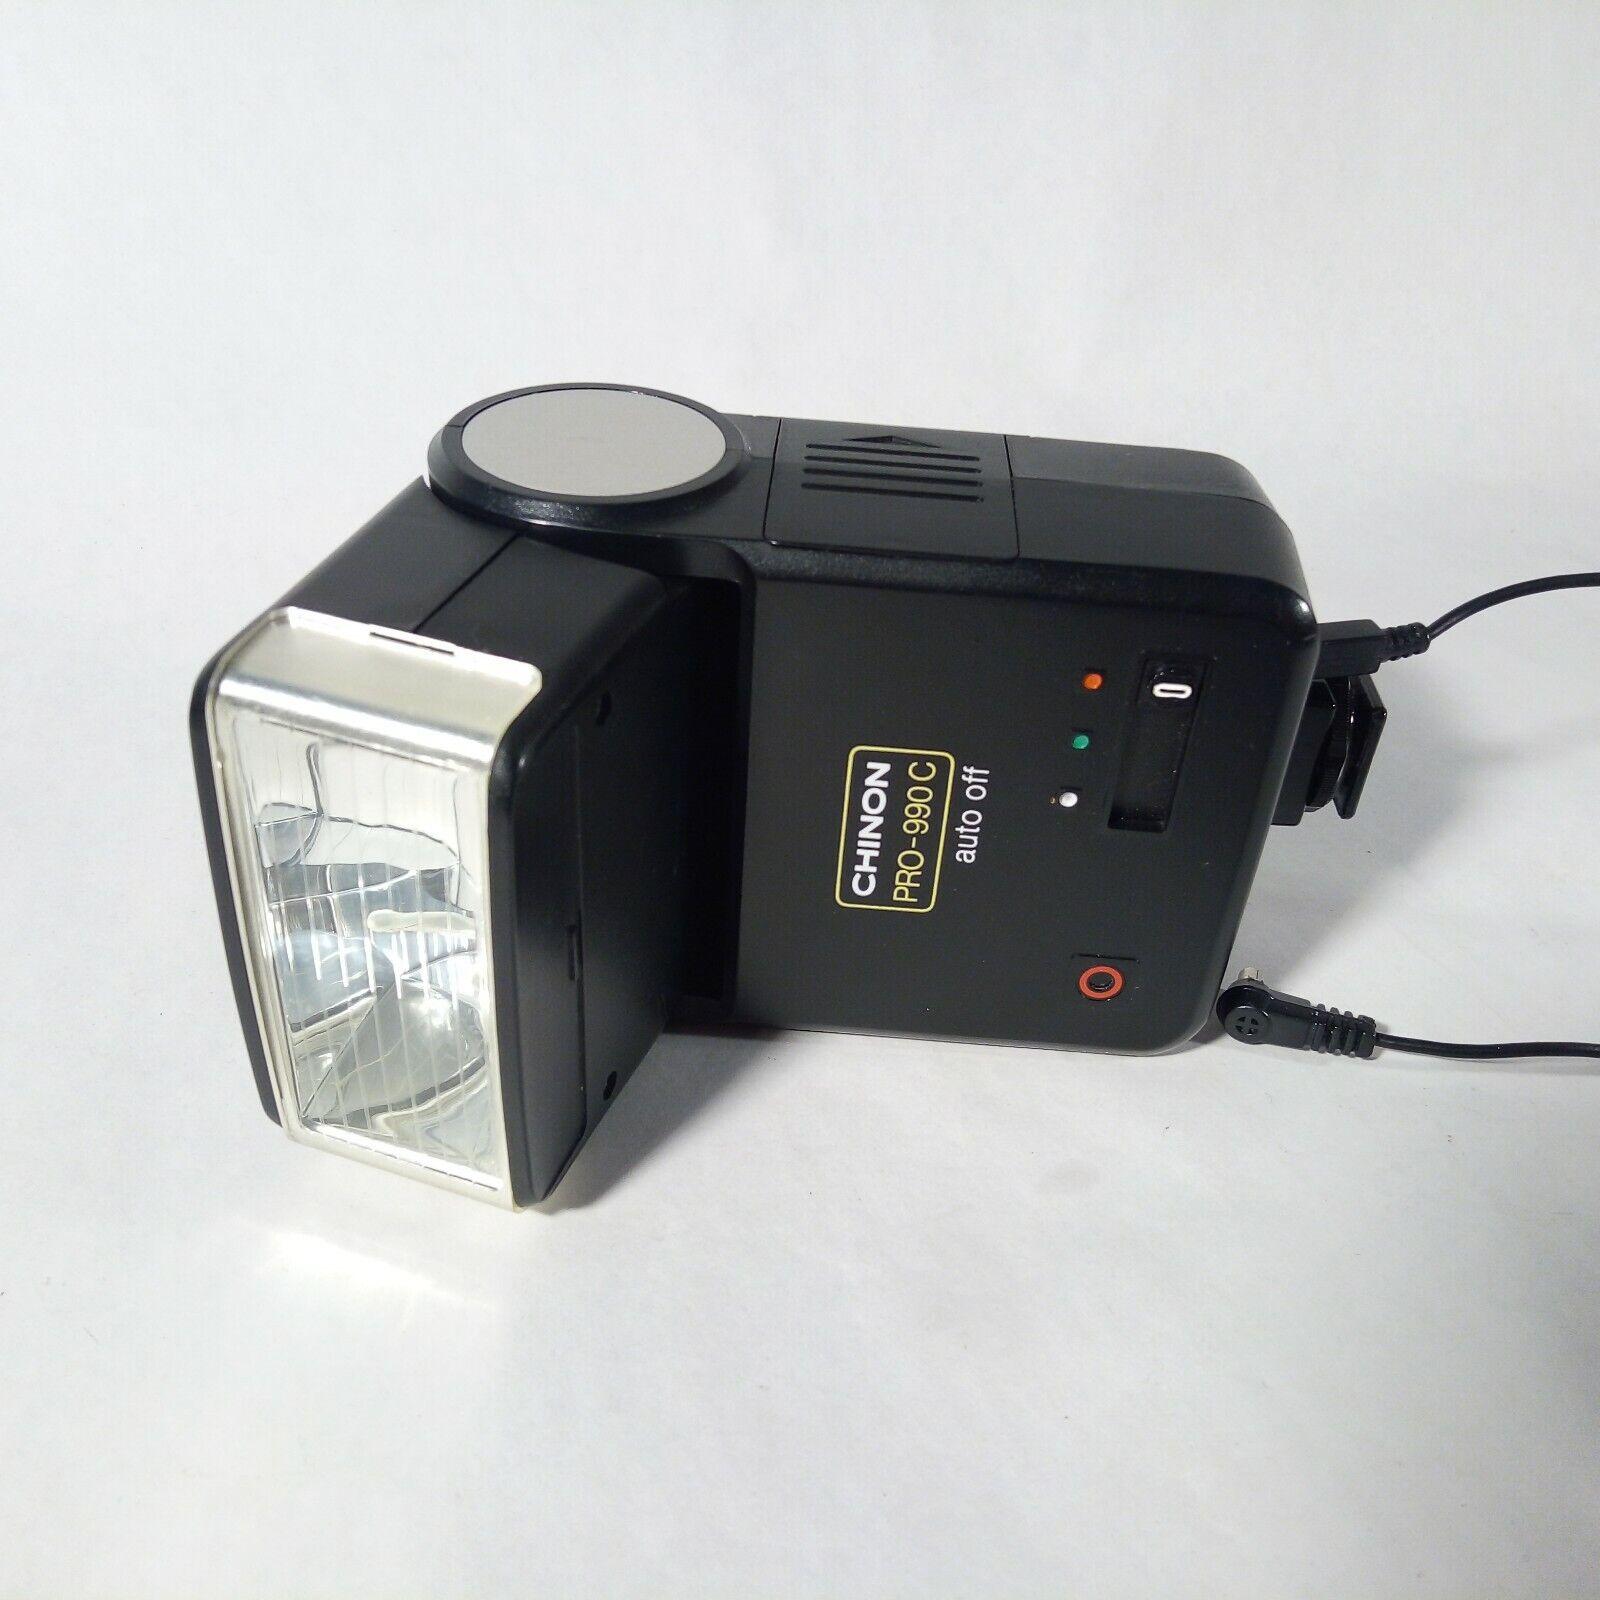 Chinon Pro-990C auto Thyristor Vintage Flash + sync cable - 35mm Film